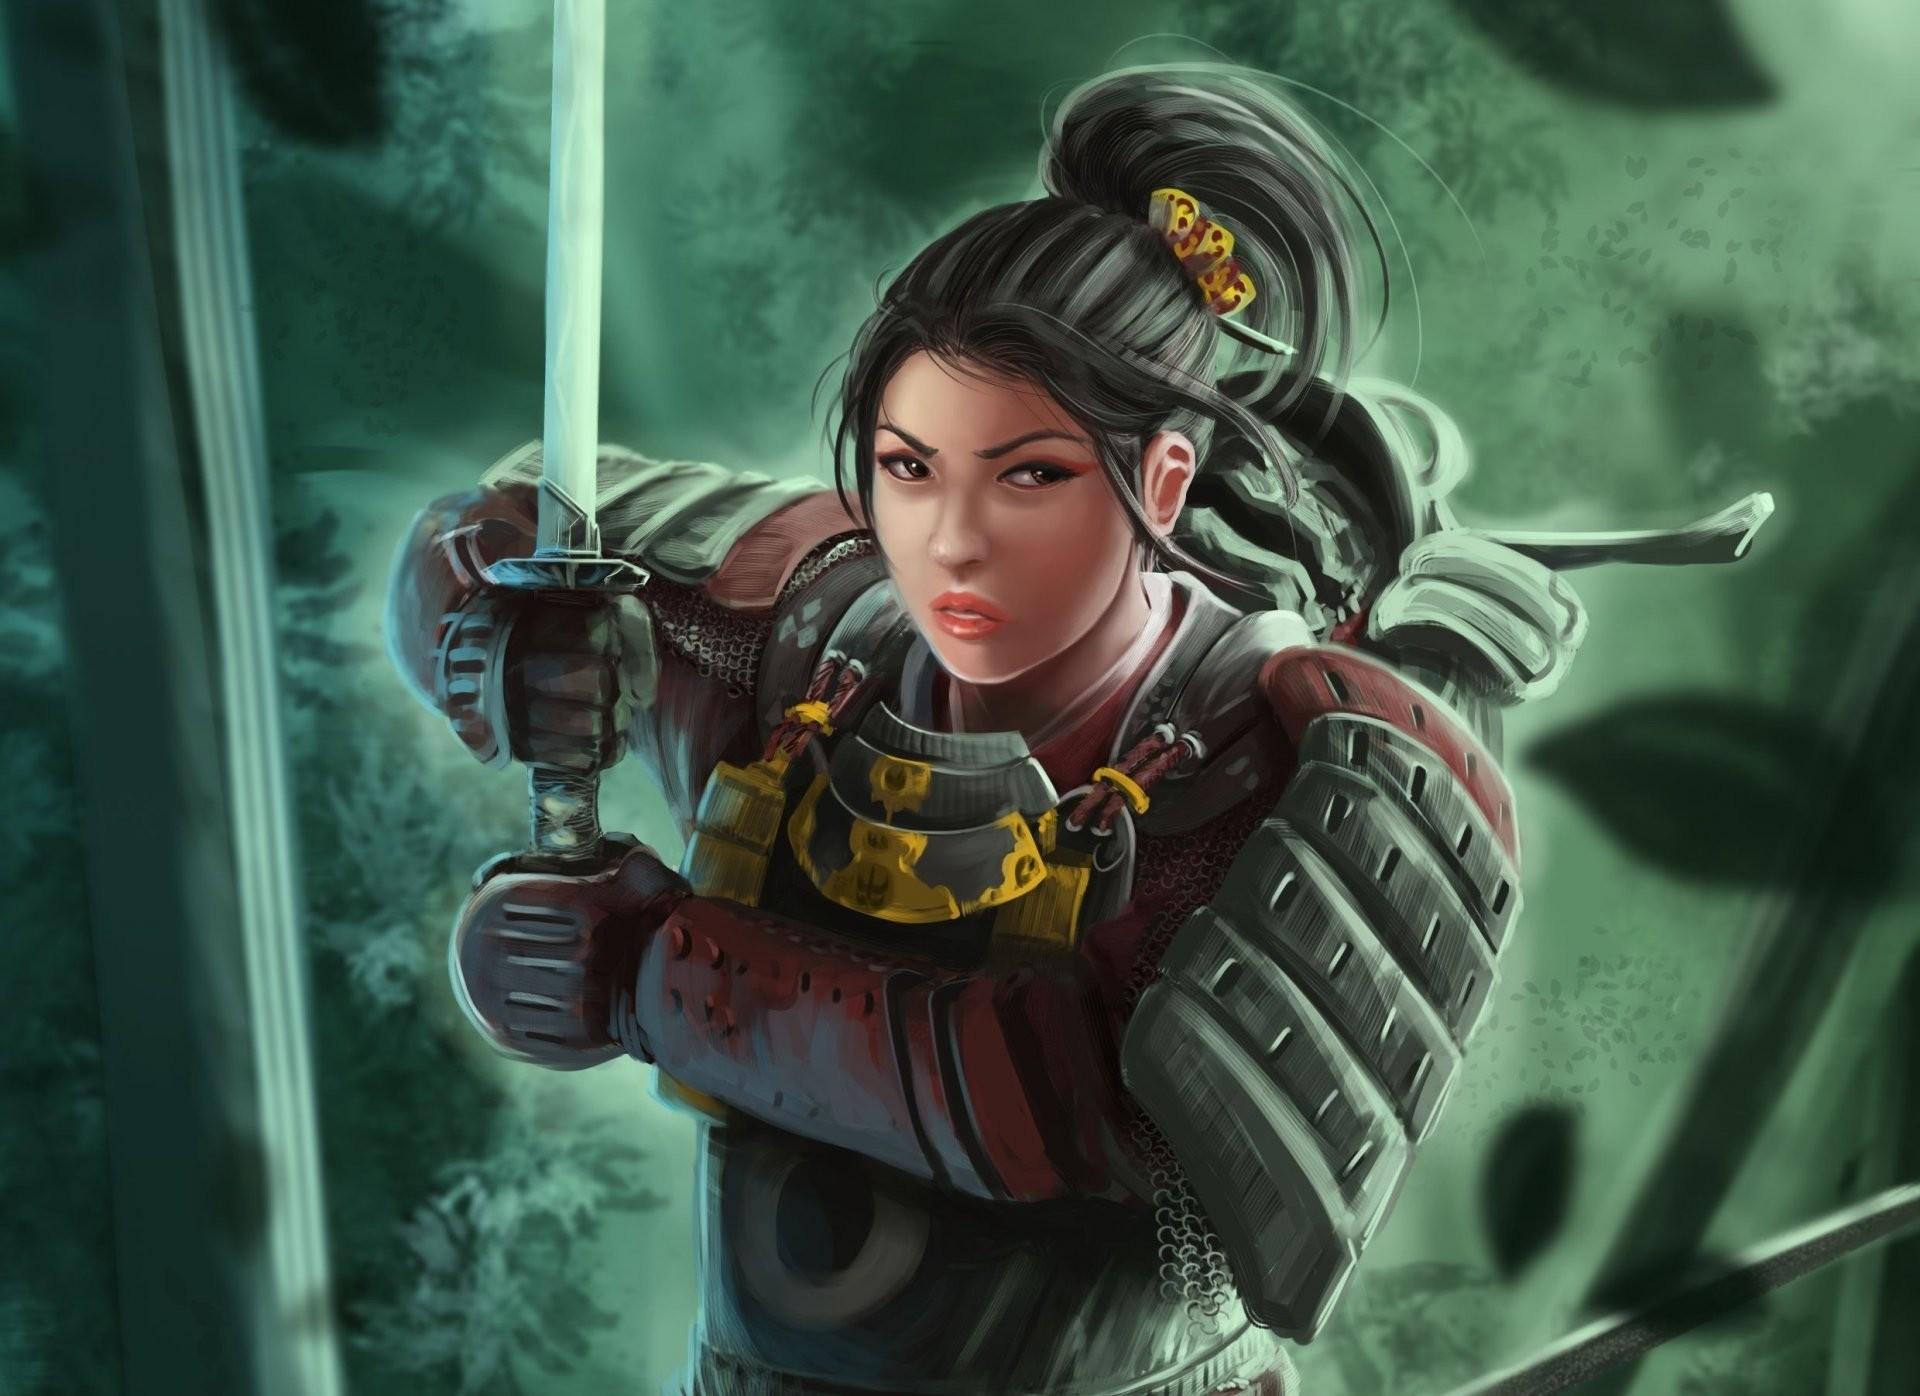 Samurai Girl Wallpaper 76 Images